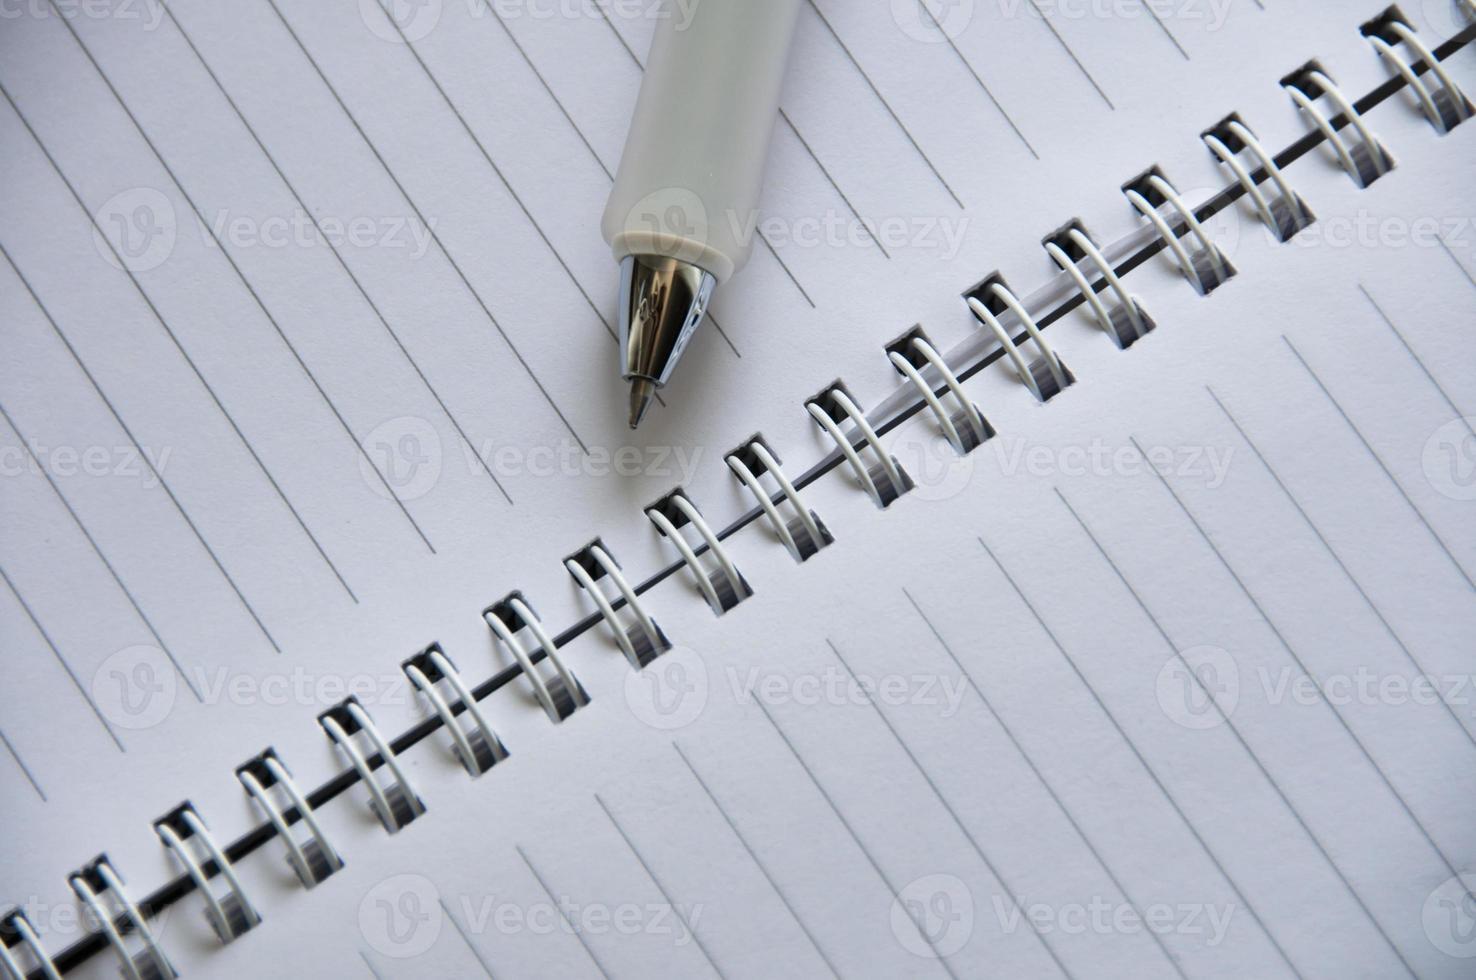 notebook, lege planner foto